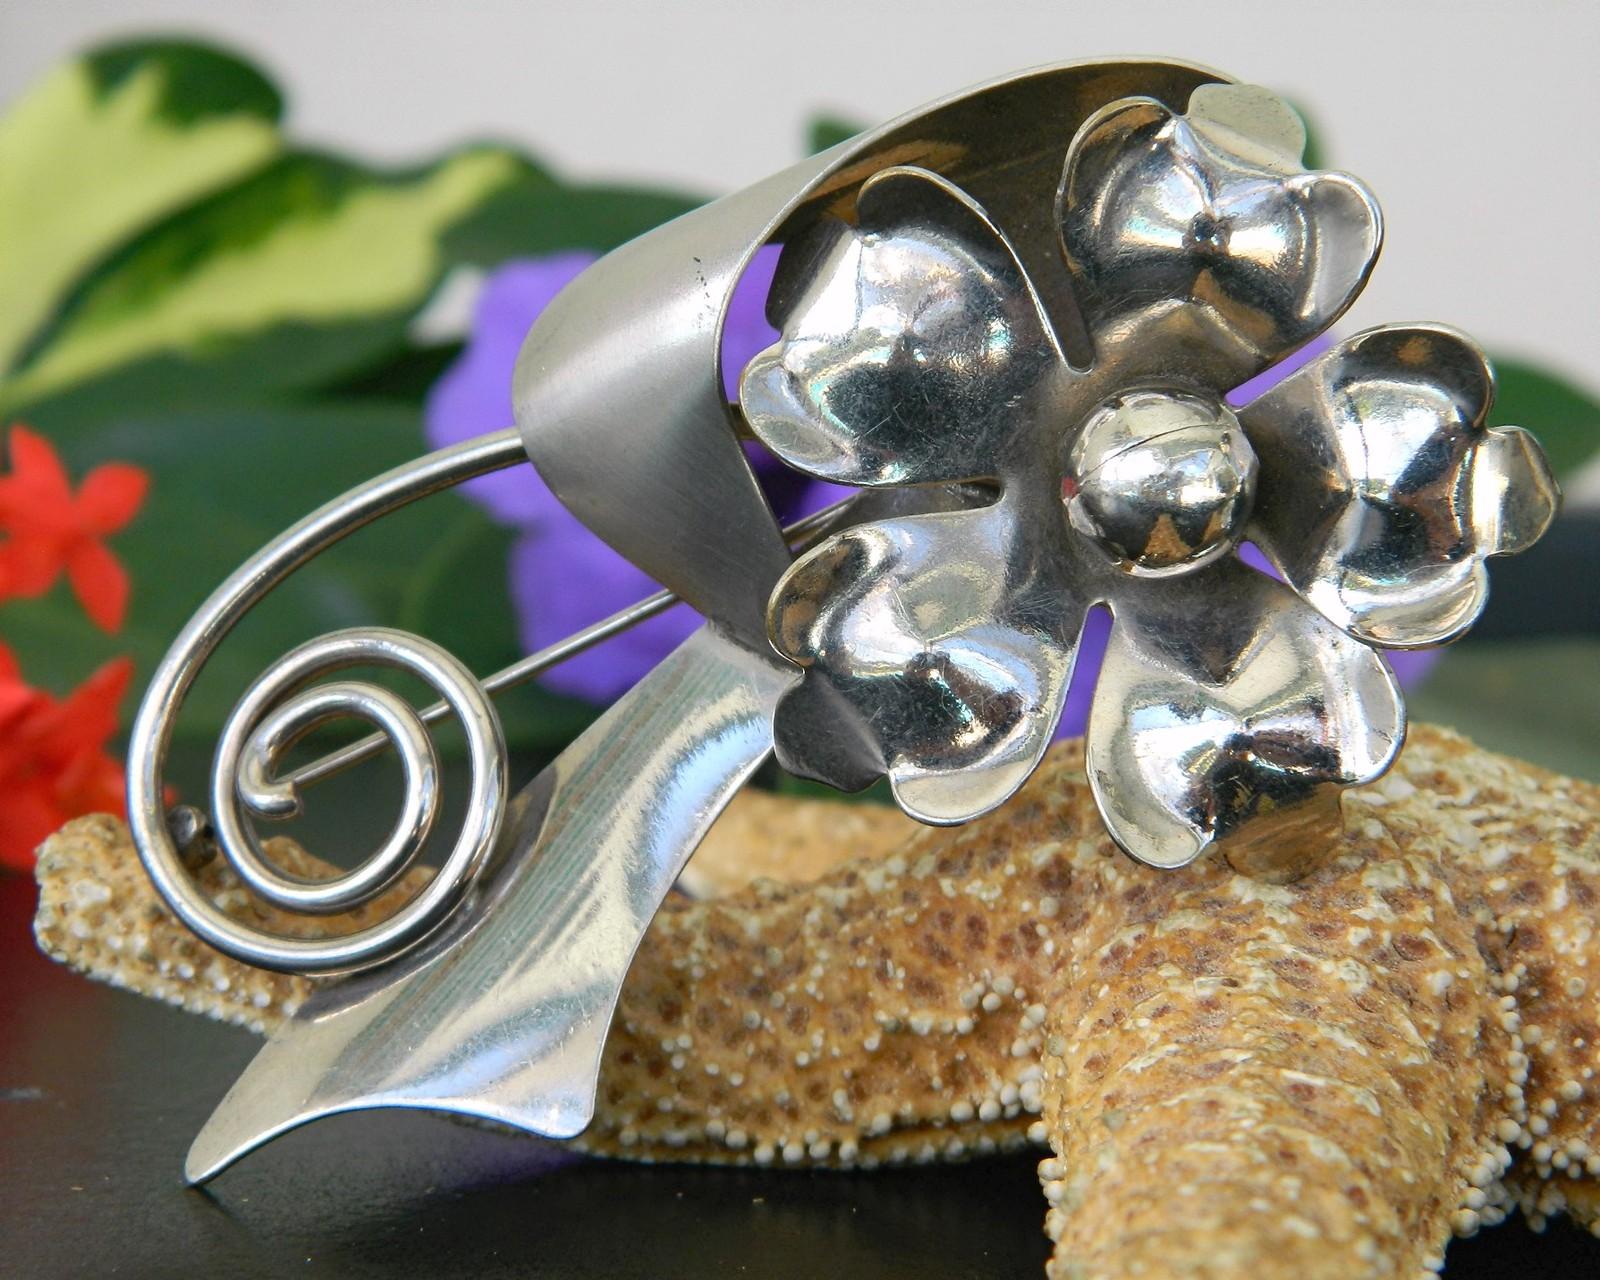 Vintage Metal Long Stem Art Flower Brooch Pin Large 1950s Silver Tone